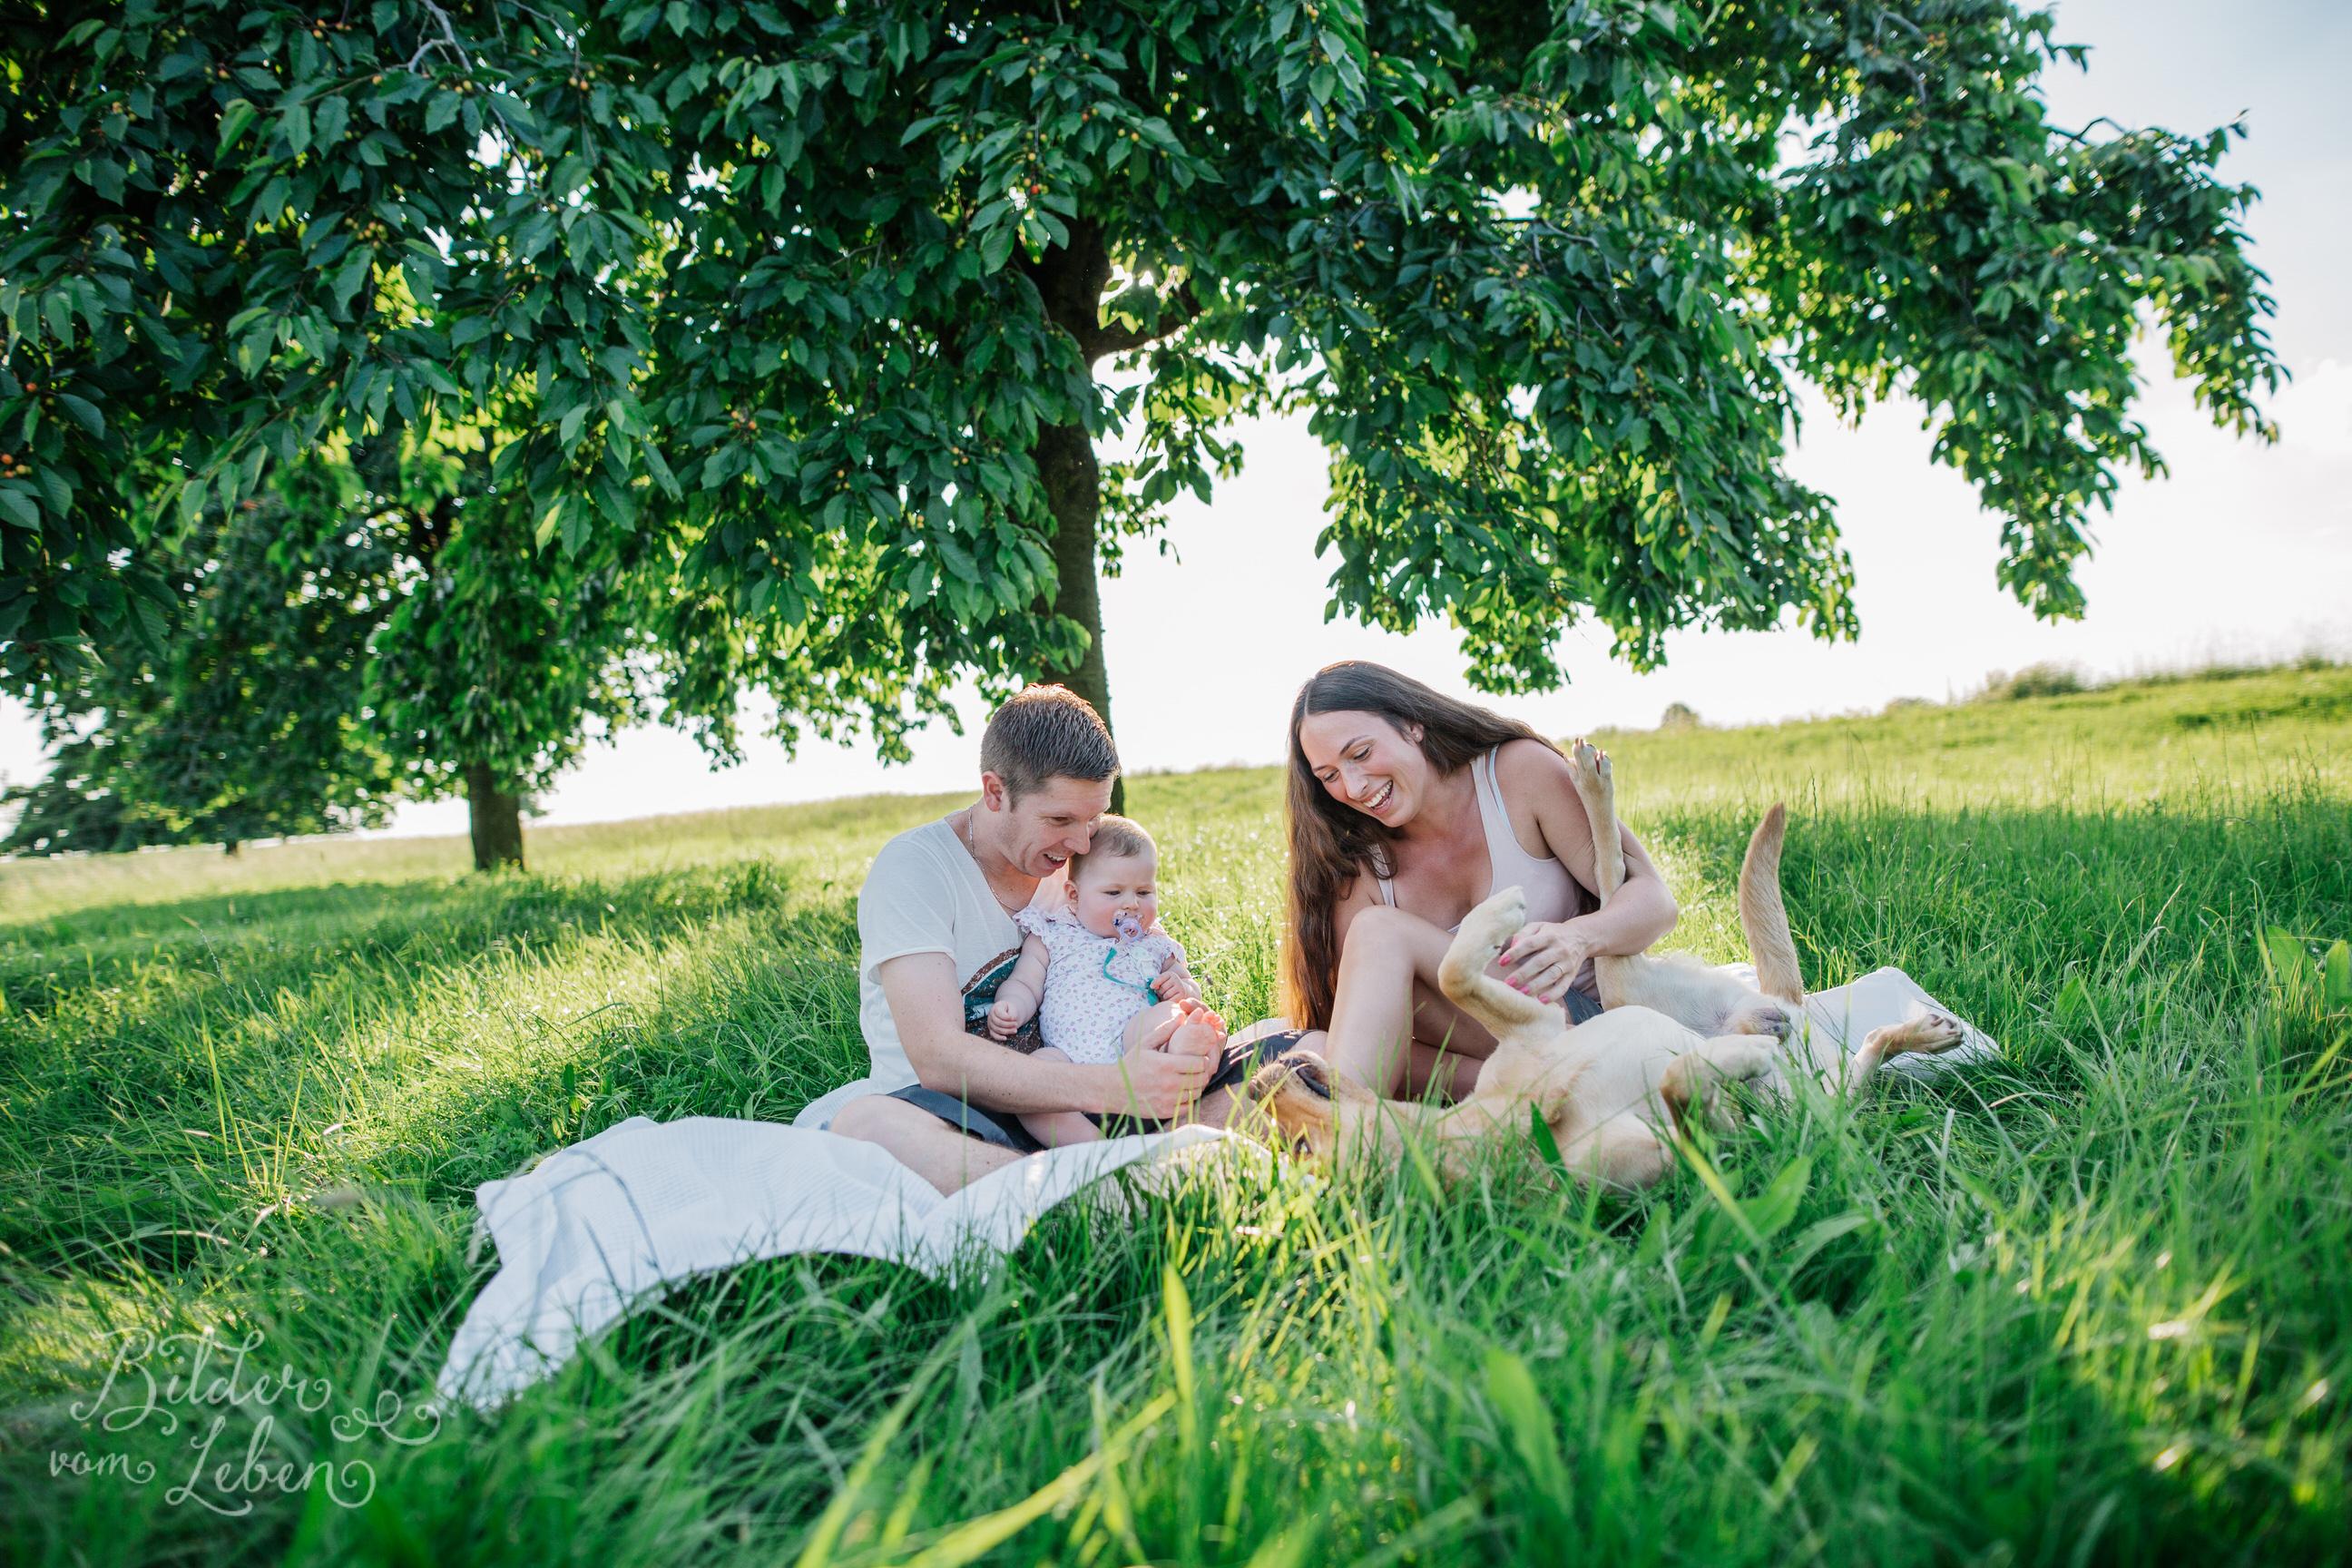 Greta-Labrador-Kinder-Portraits-BildervomLeben-2016-8028